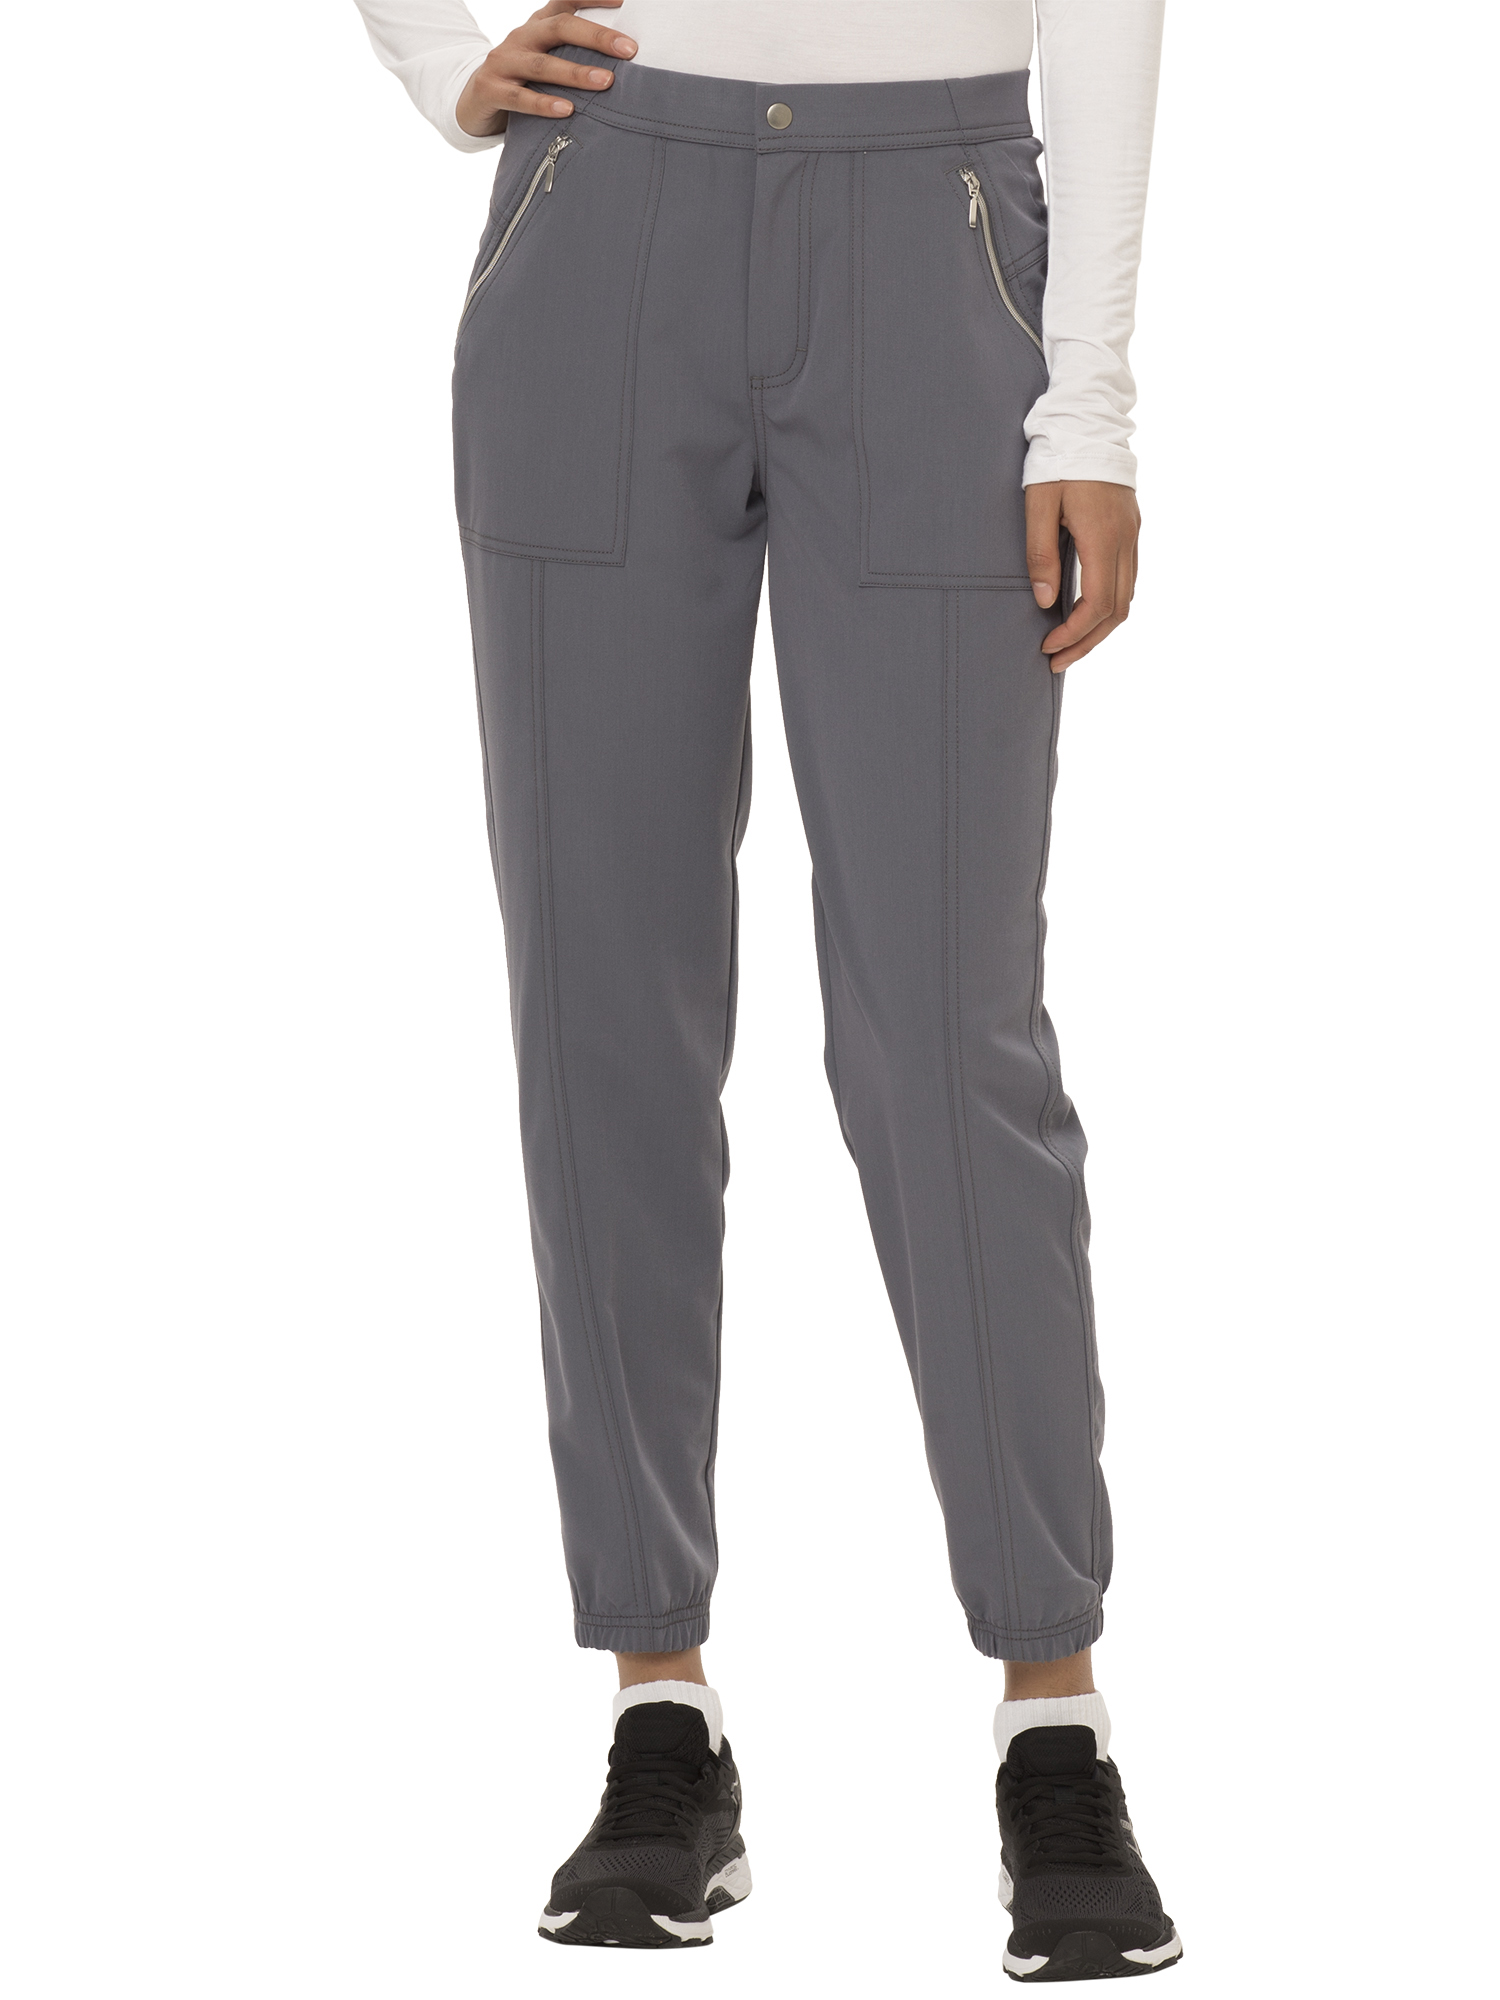 Scrubstar Women's Signature Fashion Collection Modern Fit Stretch Jogger Scrub Pant